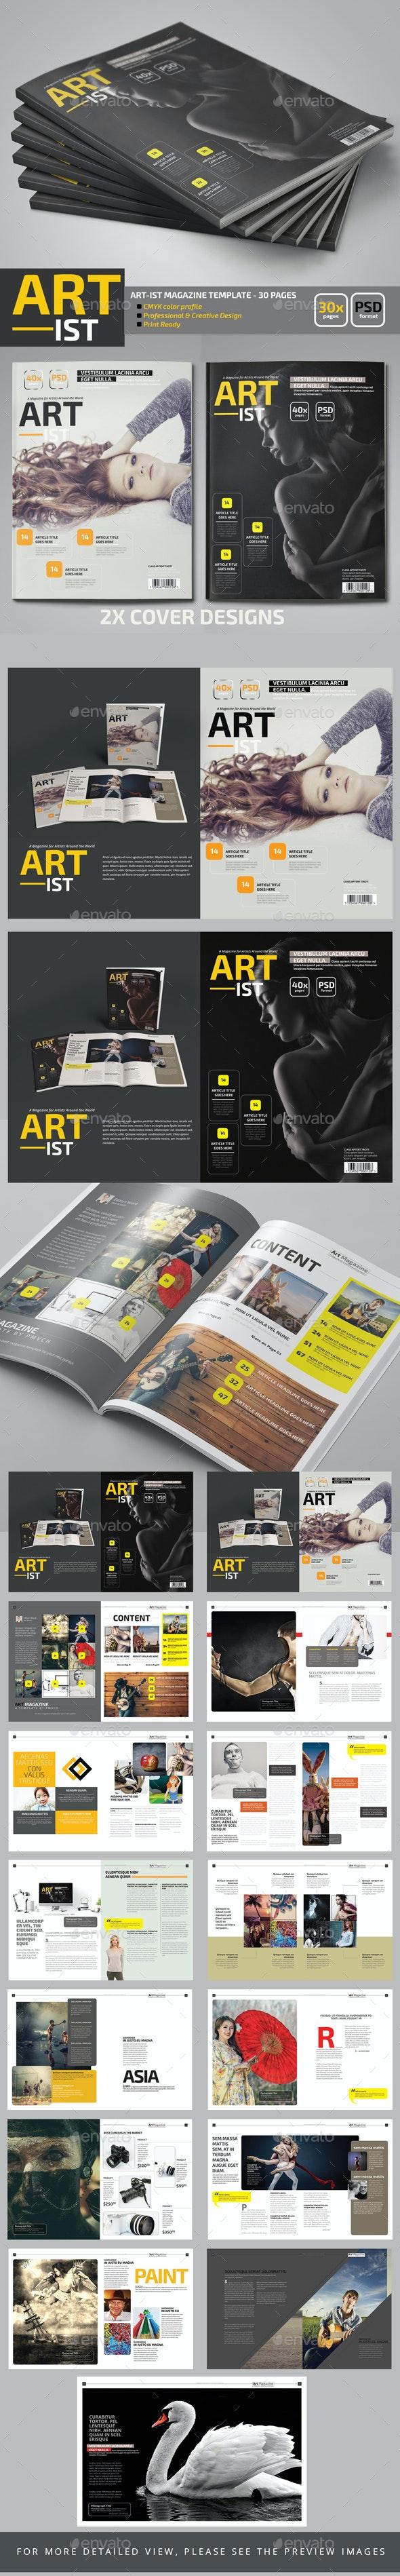 Art-ist Magazine Template - Magazines Print Templates